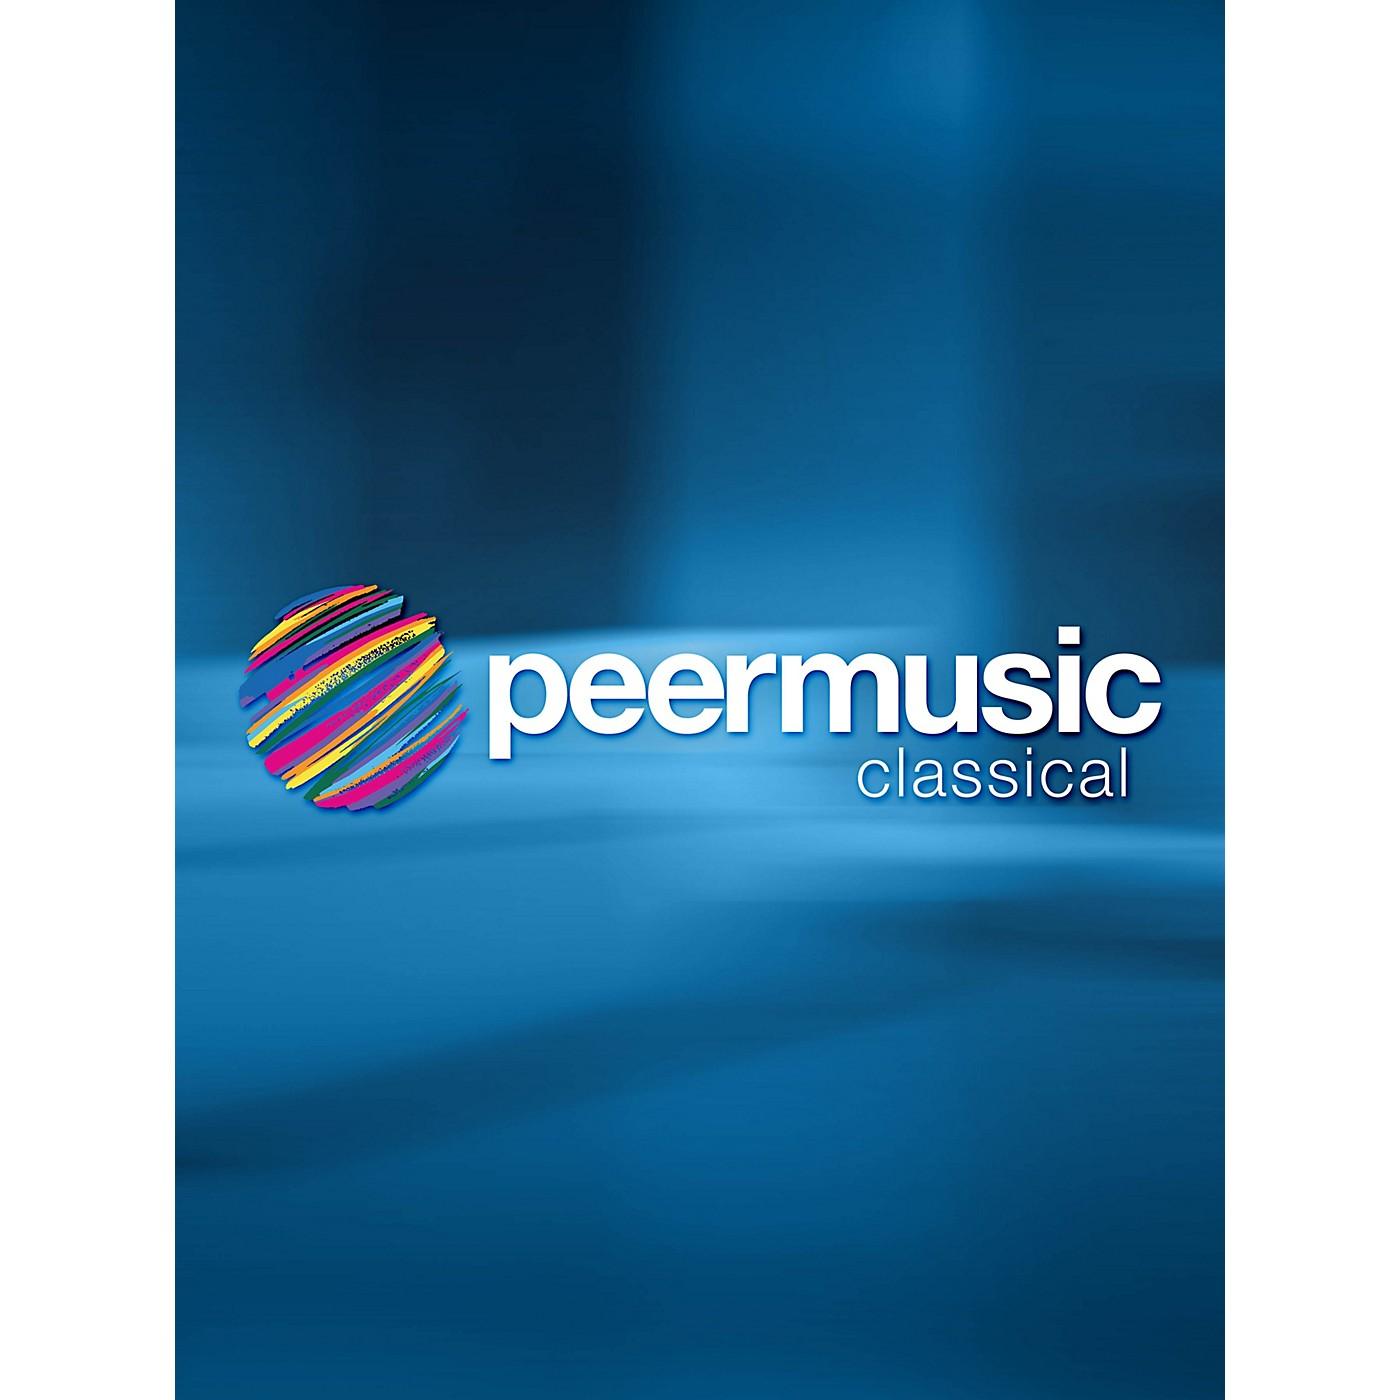 Peer Music Trio d'anches (Oboe, Clarinet, Bassoon) Peermusic Classical Series Book by Charles Koechlin thumbnail